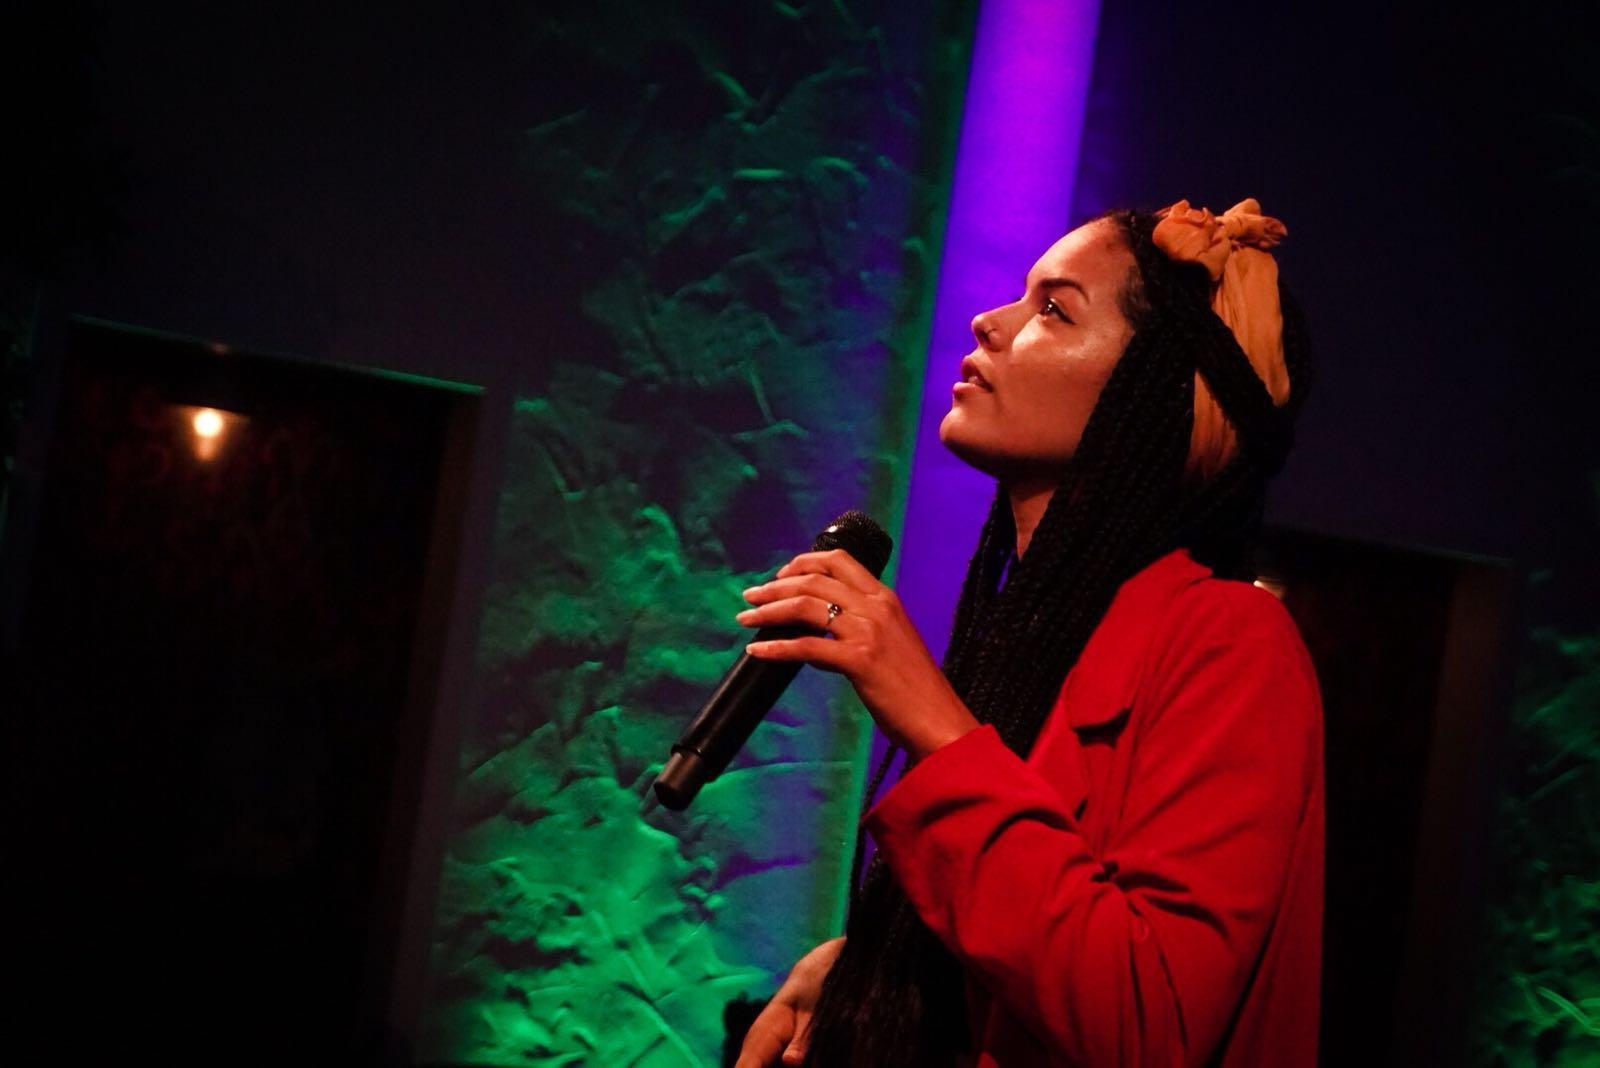 Cultural performance singing